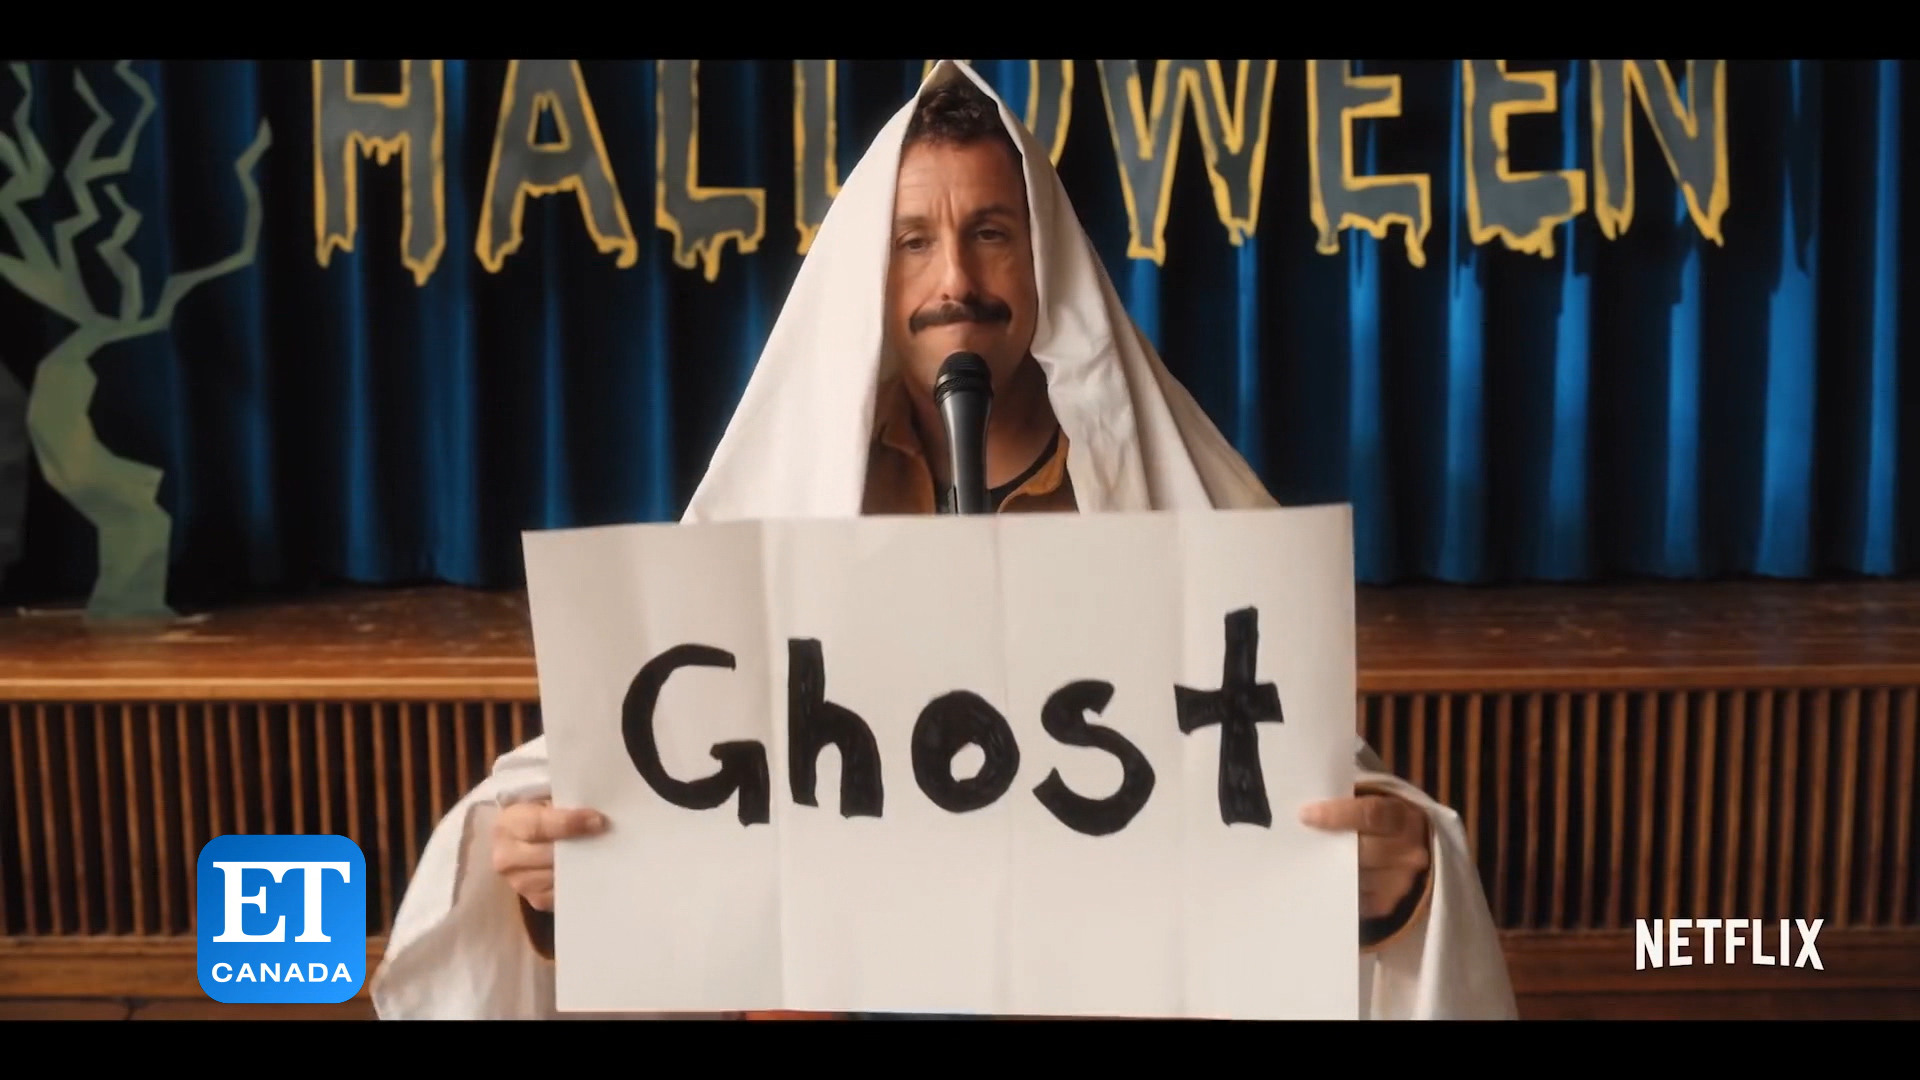 Adam Sandler Talks His New Netflix Comedy Hubie Halloween And Threat To Make The Worst Movie Ever Etcanada Com